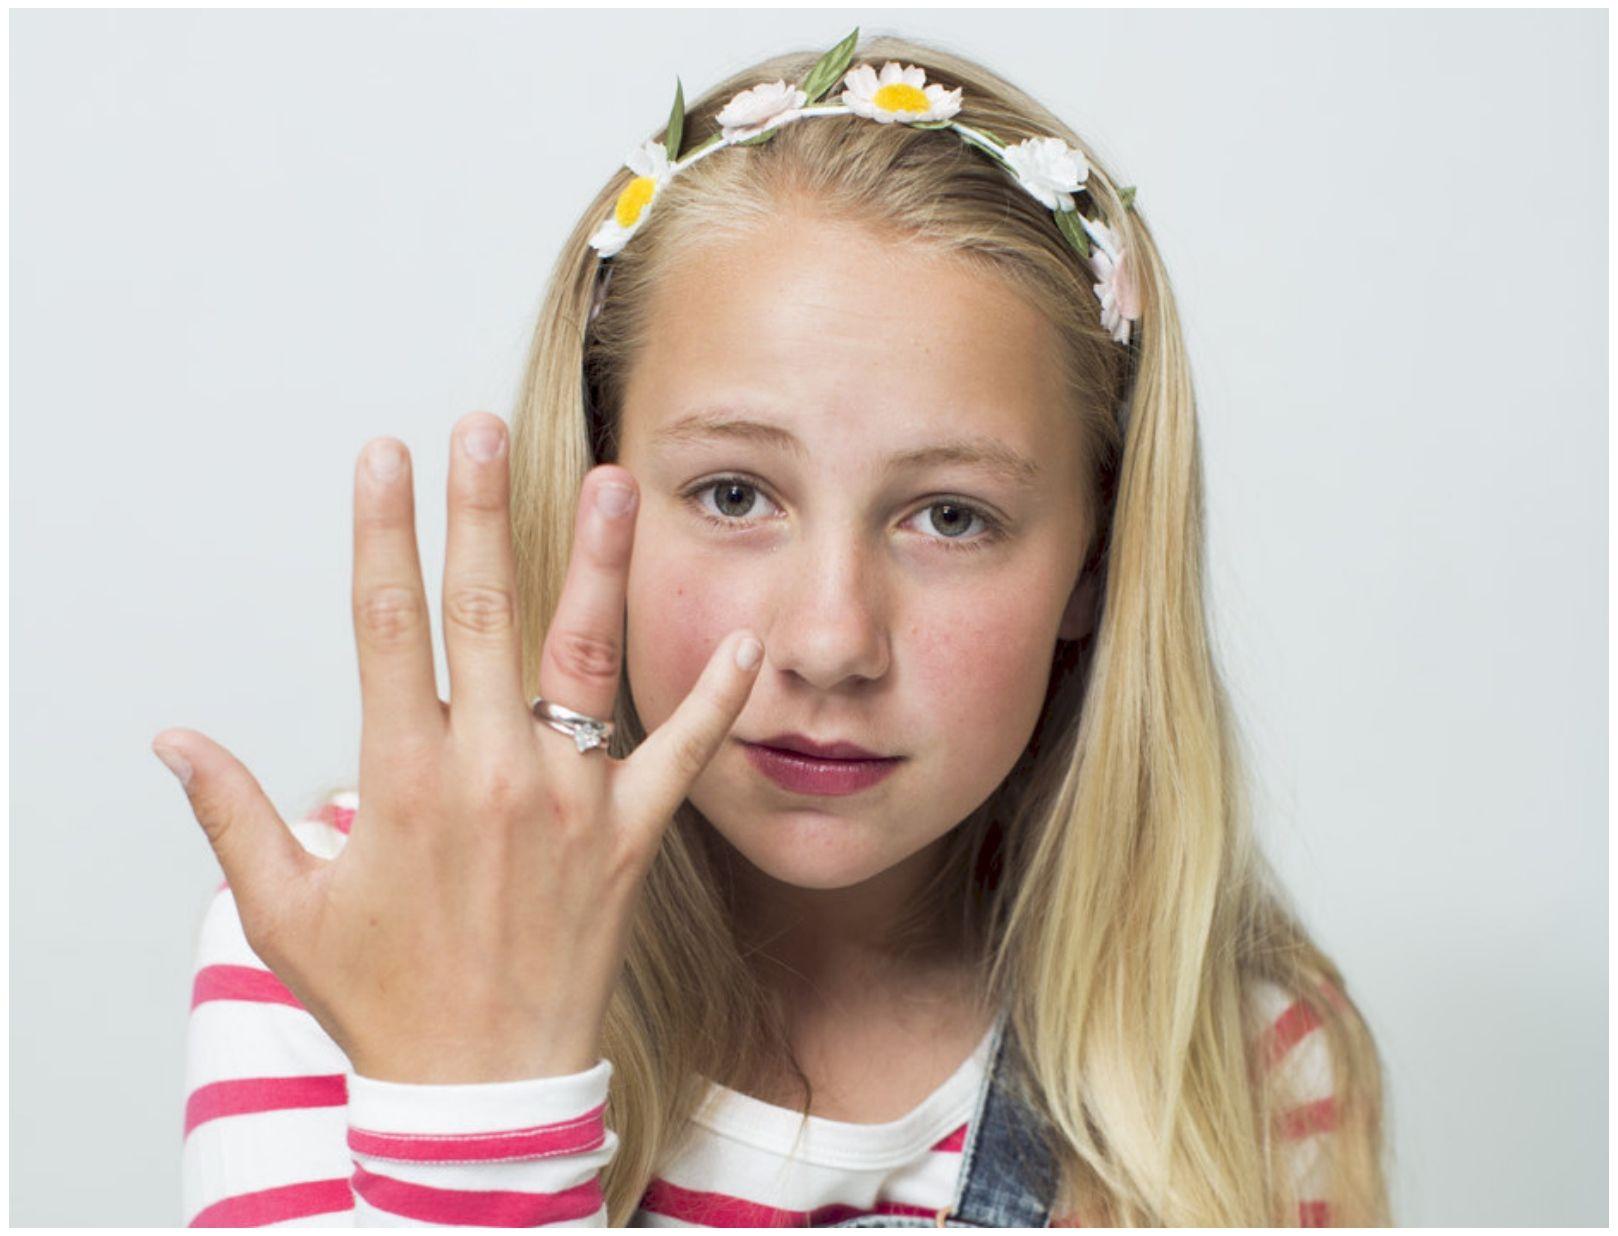 cute 12 year norwegian girls pictures | wallpapers in 2019